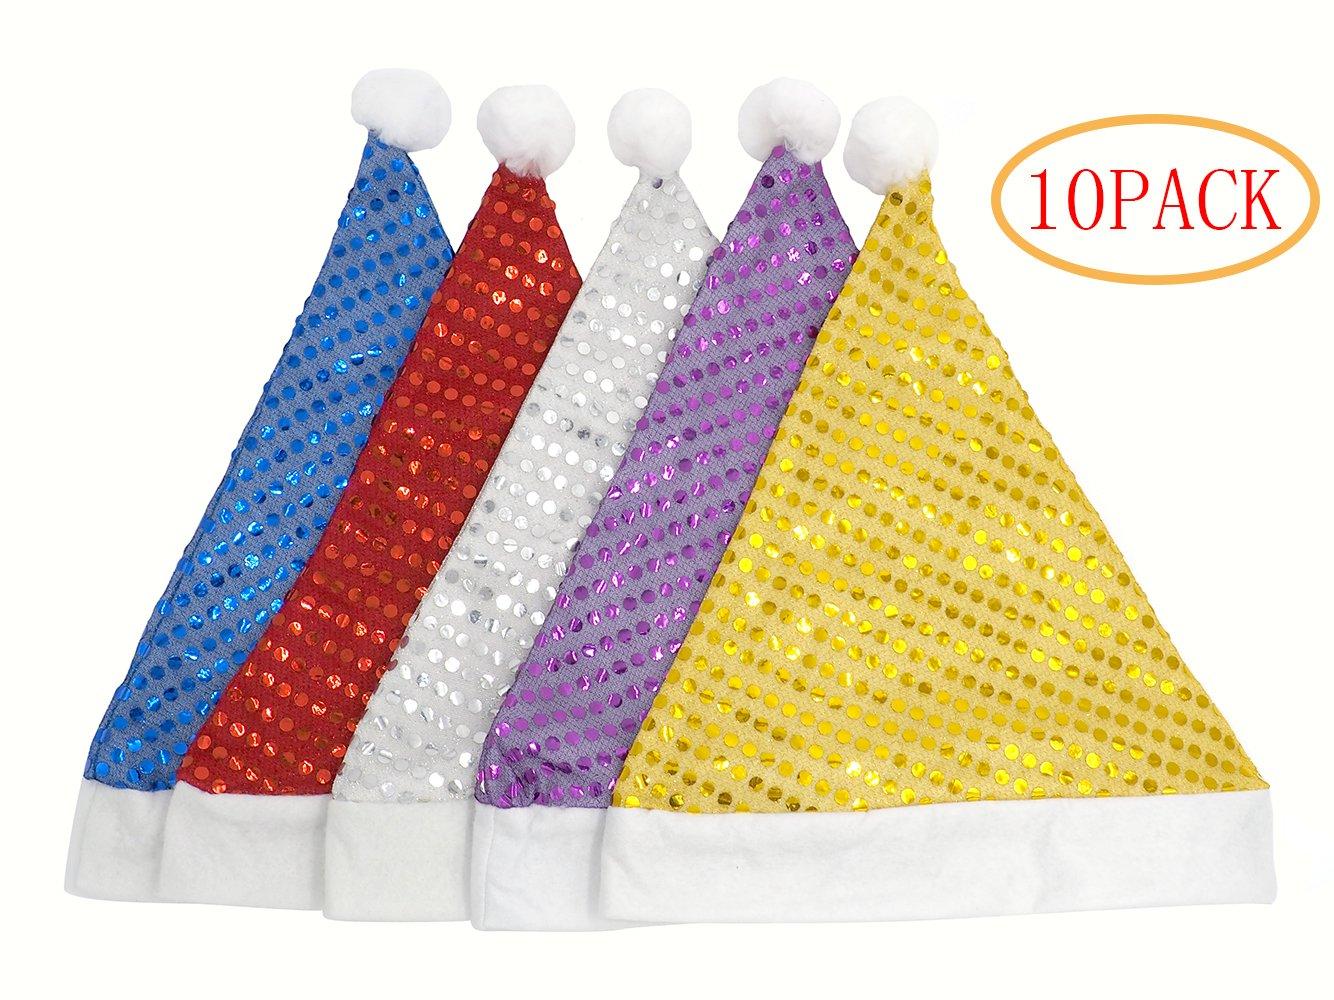 ST※park Shining Santa Hat,Pack of 10pcs Christmas Hat for Women/Men by ST※park